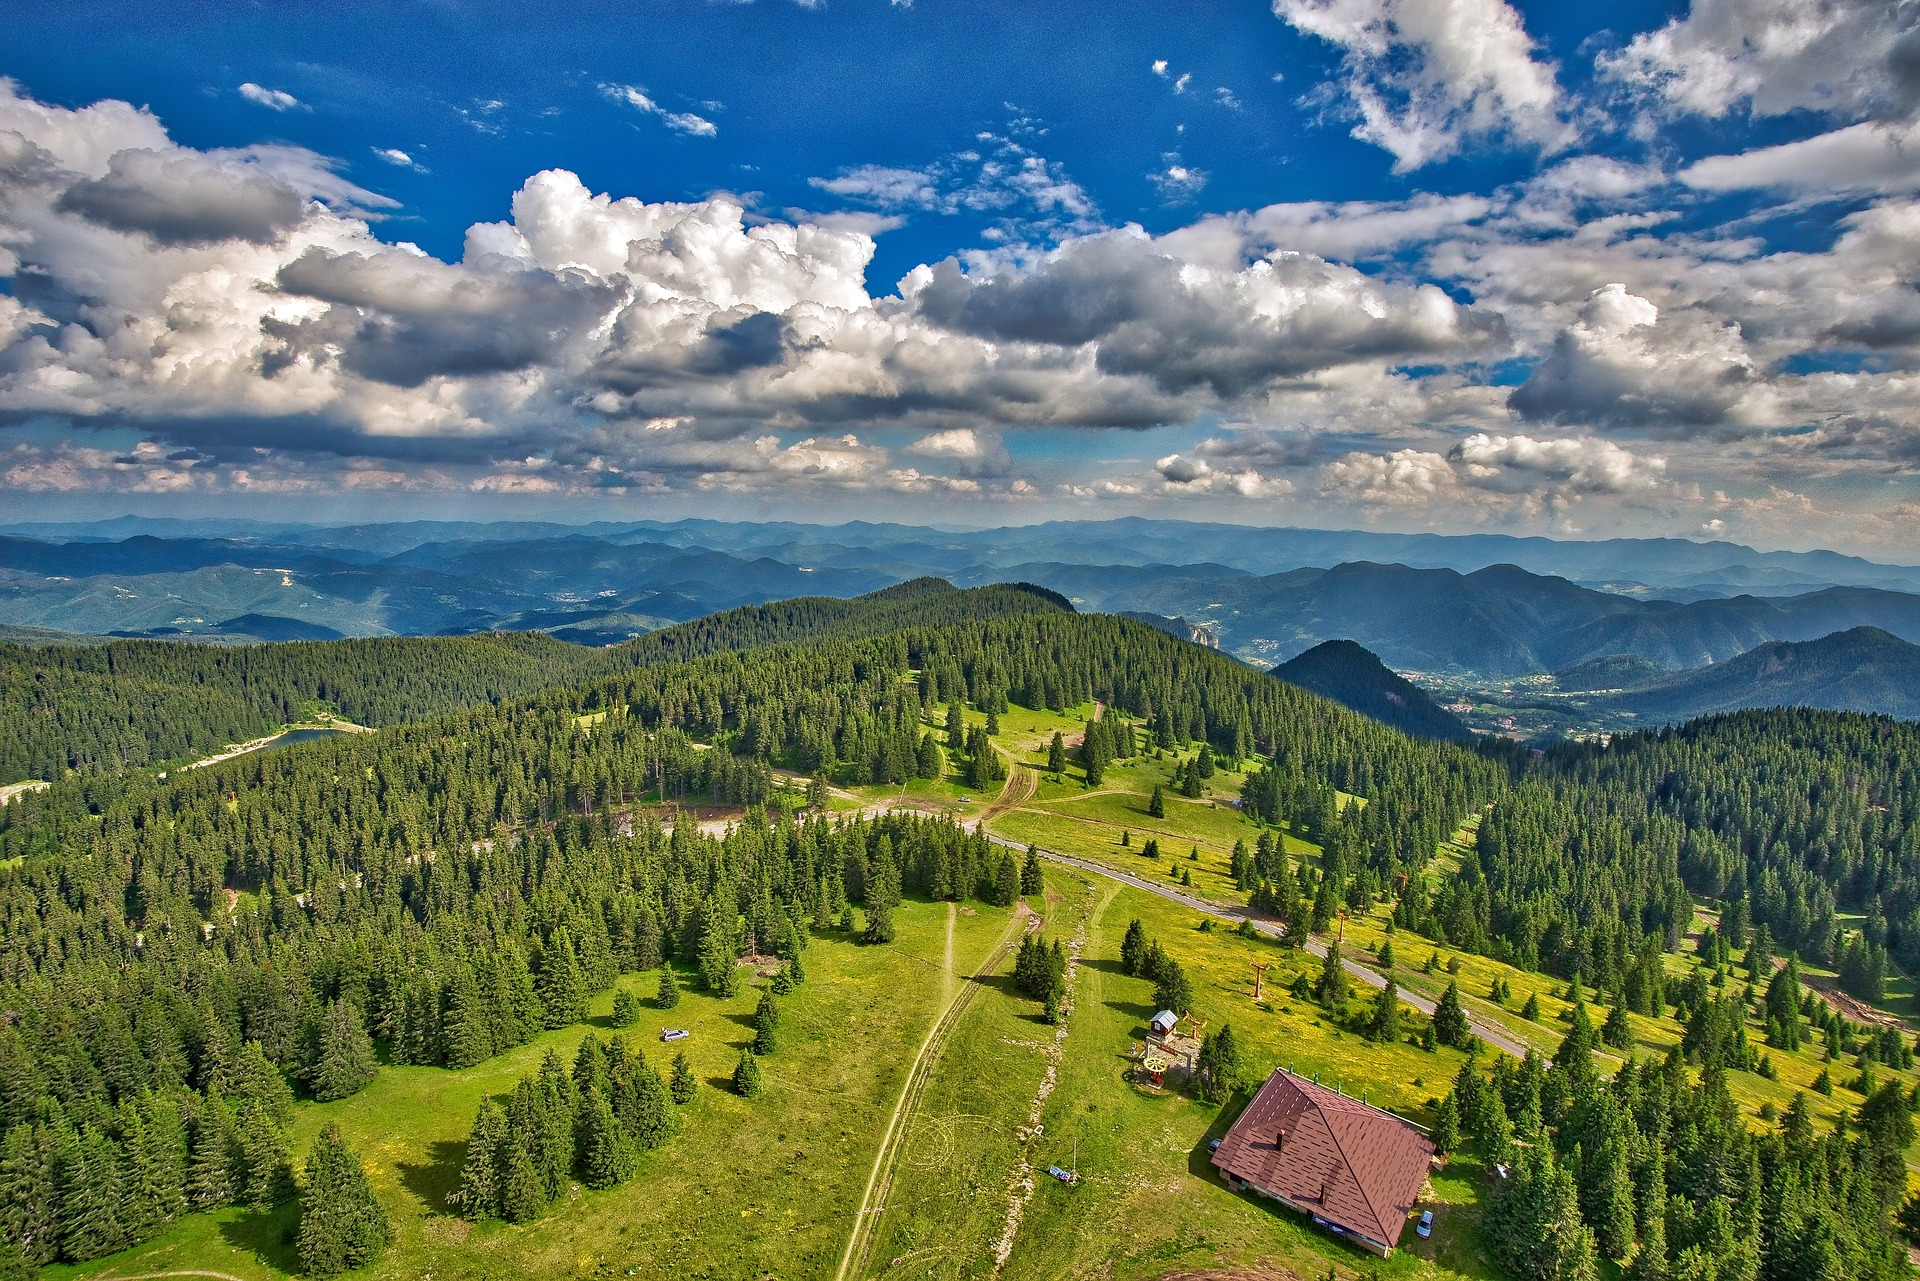 Bulgarie_CC0.jpg?1545560984